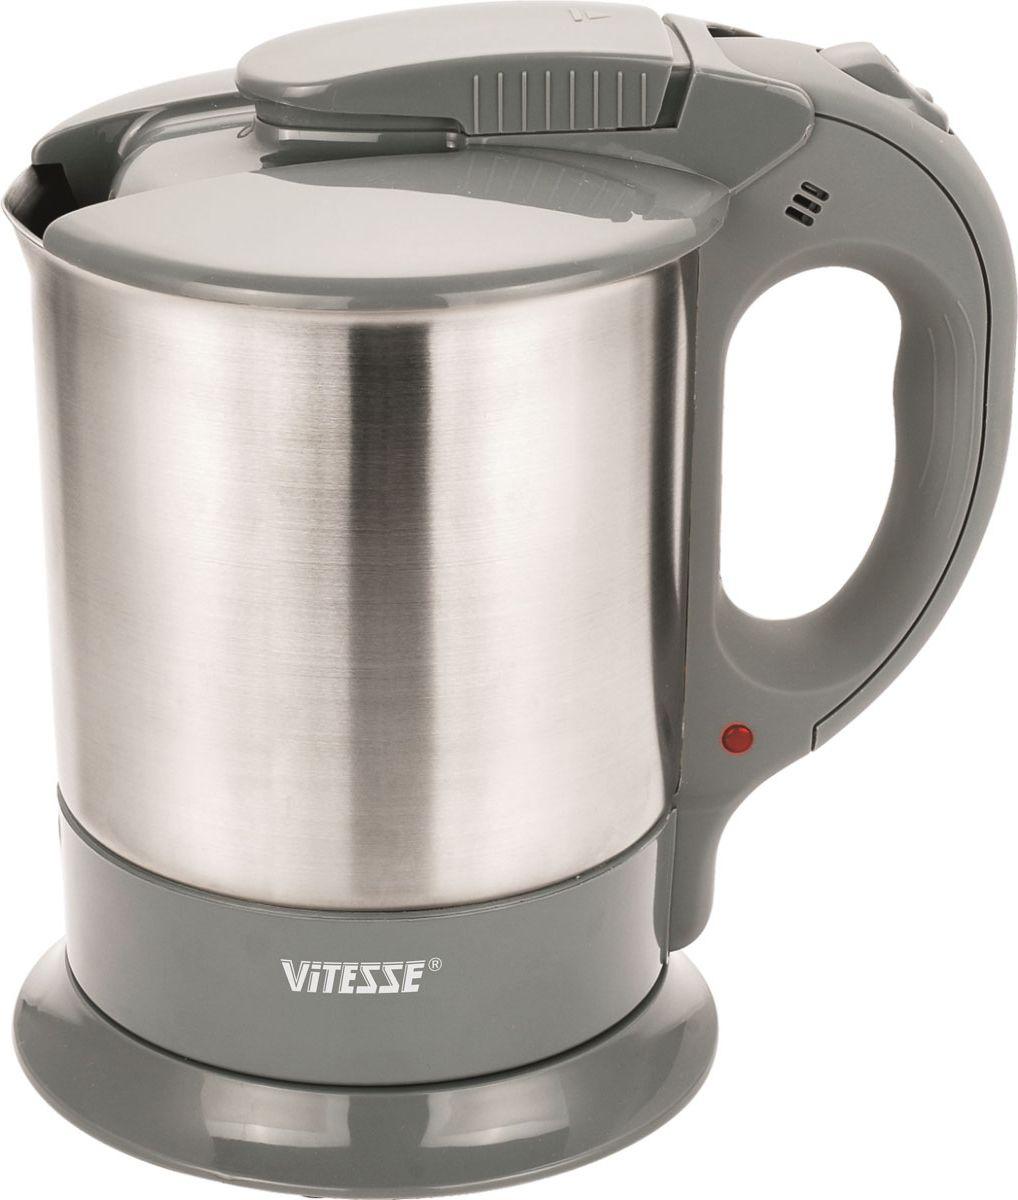 Электрический чайник Vitesse Vitesse VS-104 Gray Metallic, Черный-Серебристый  #1